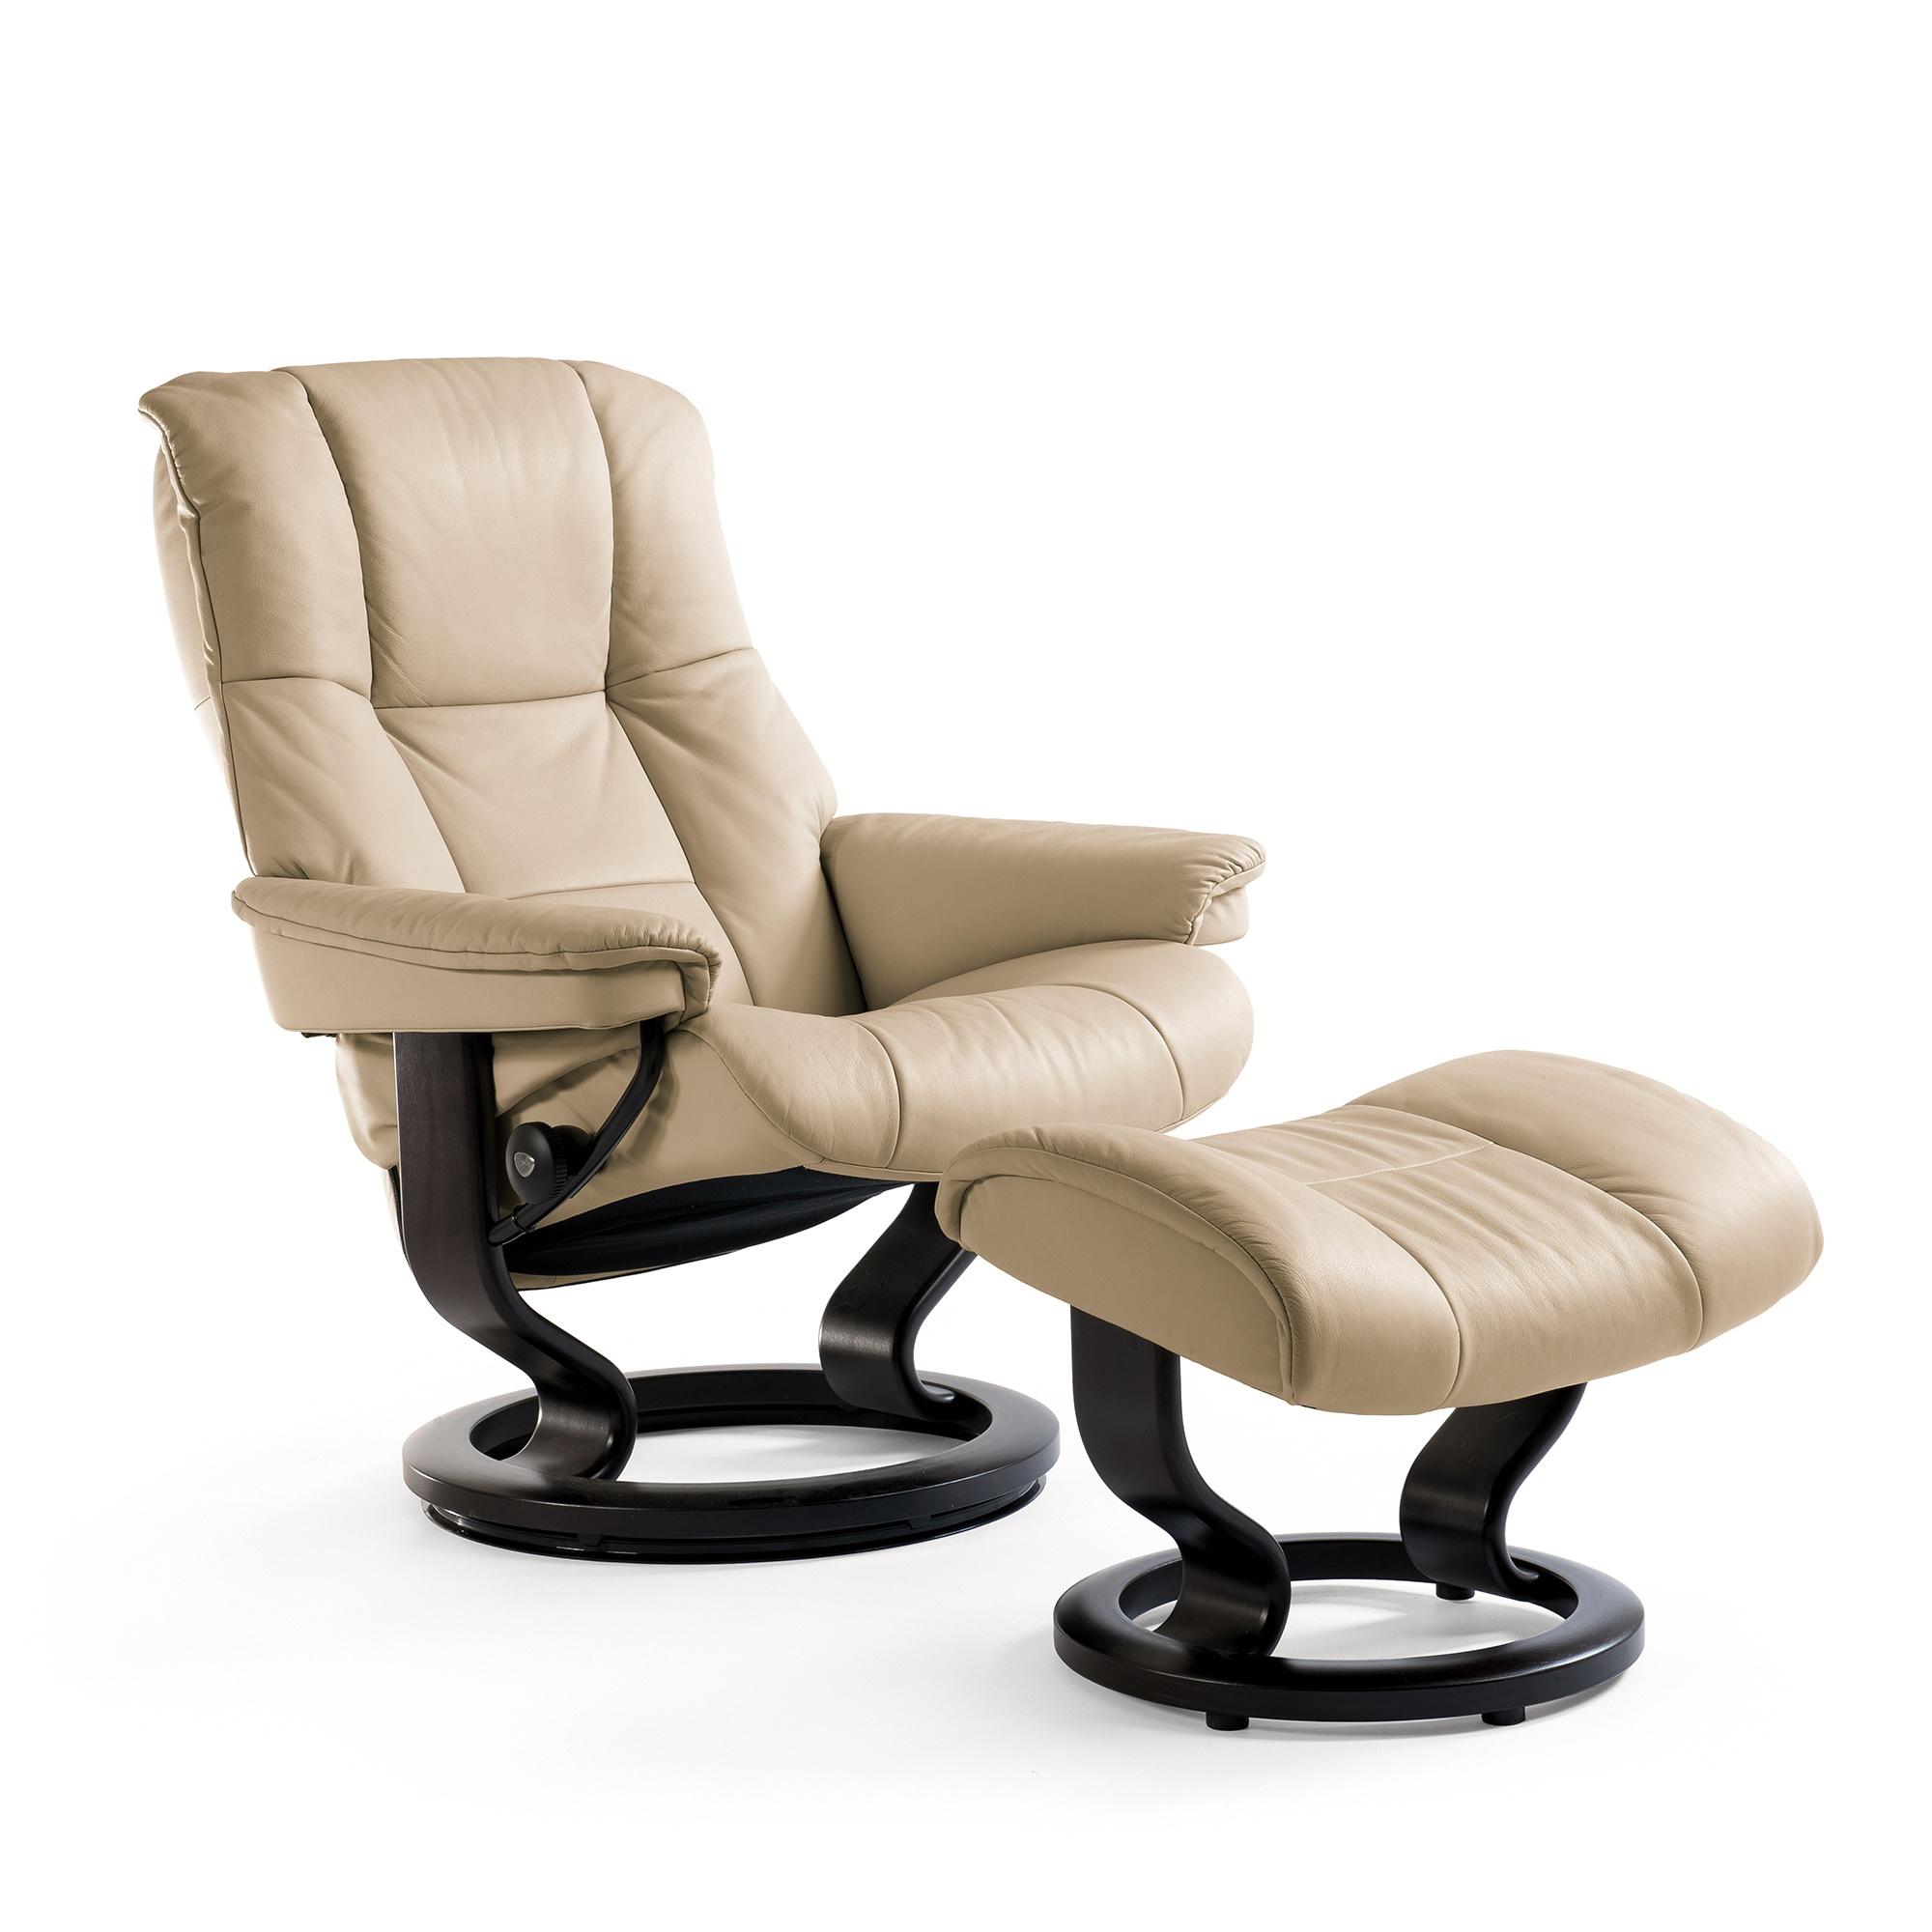 Stressless Mayfair Chair Amp Stool